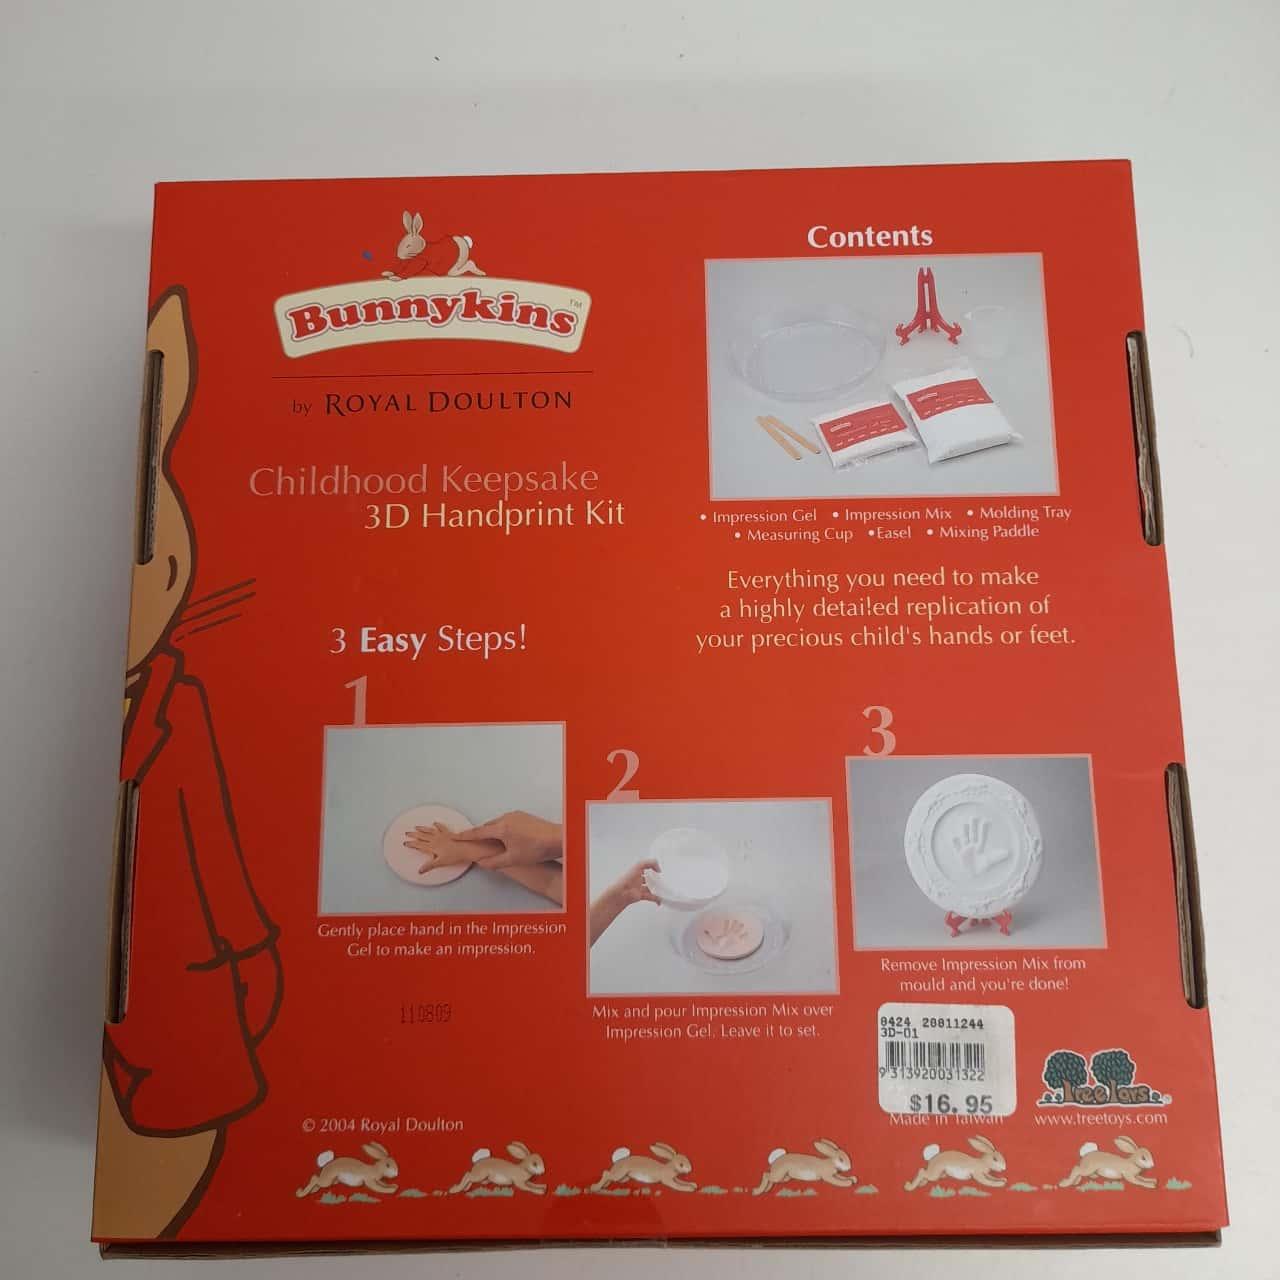 Bunnykins by Royal Doulton 3D Handprint Kit